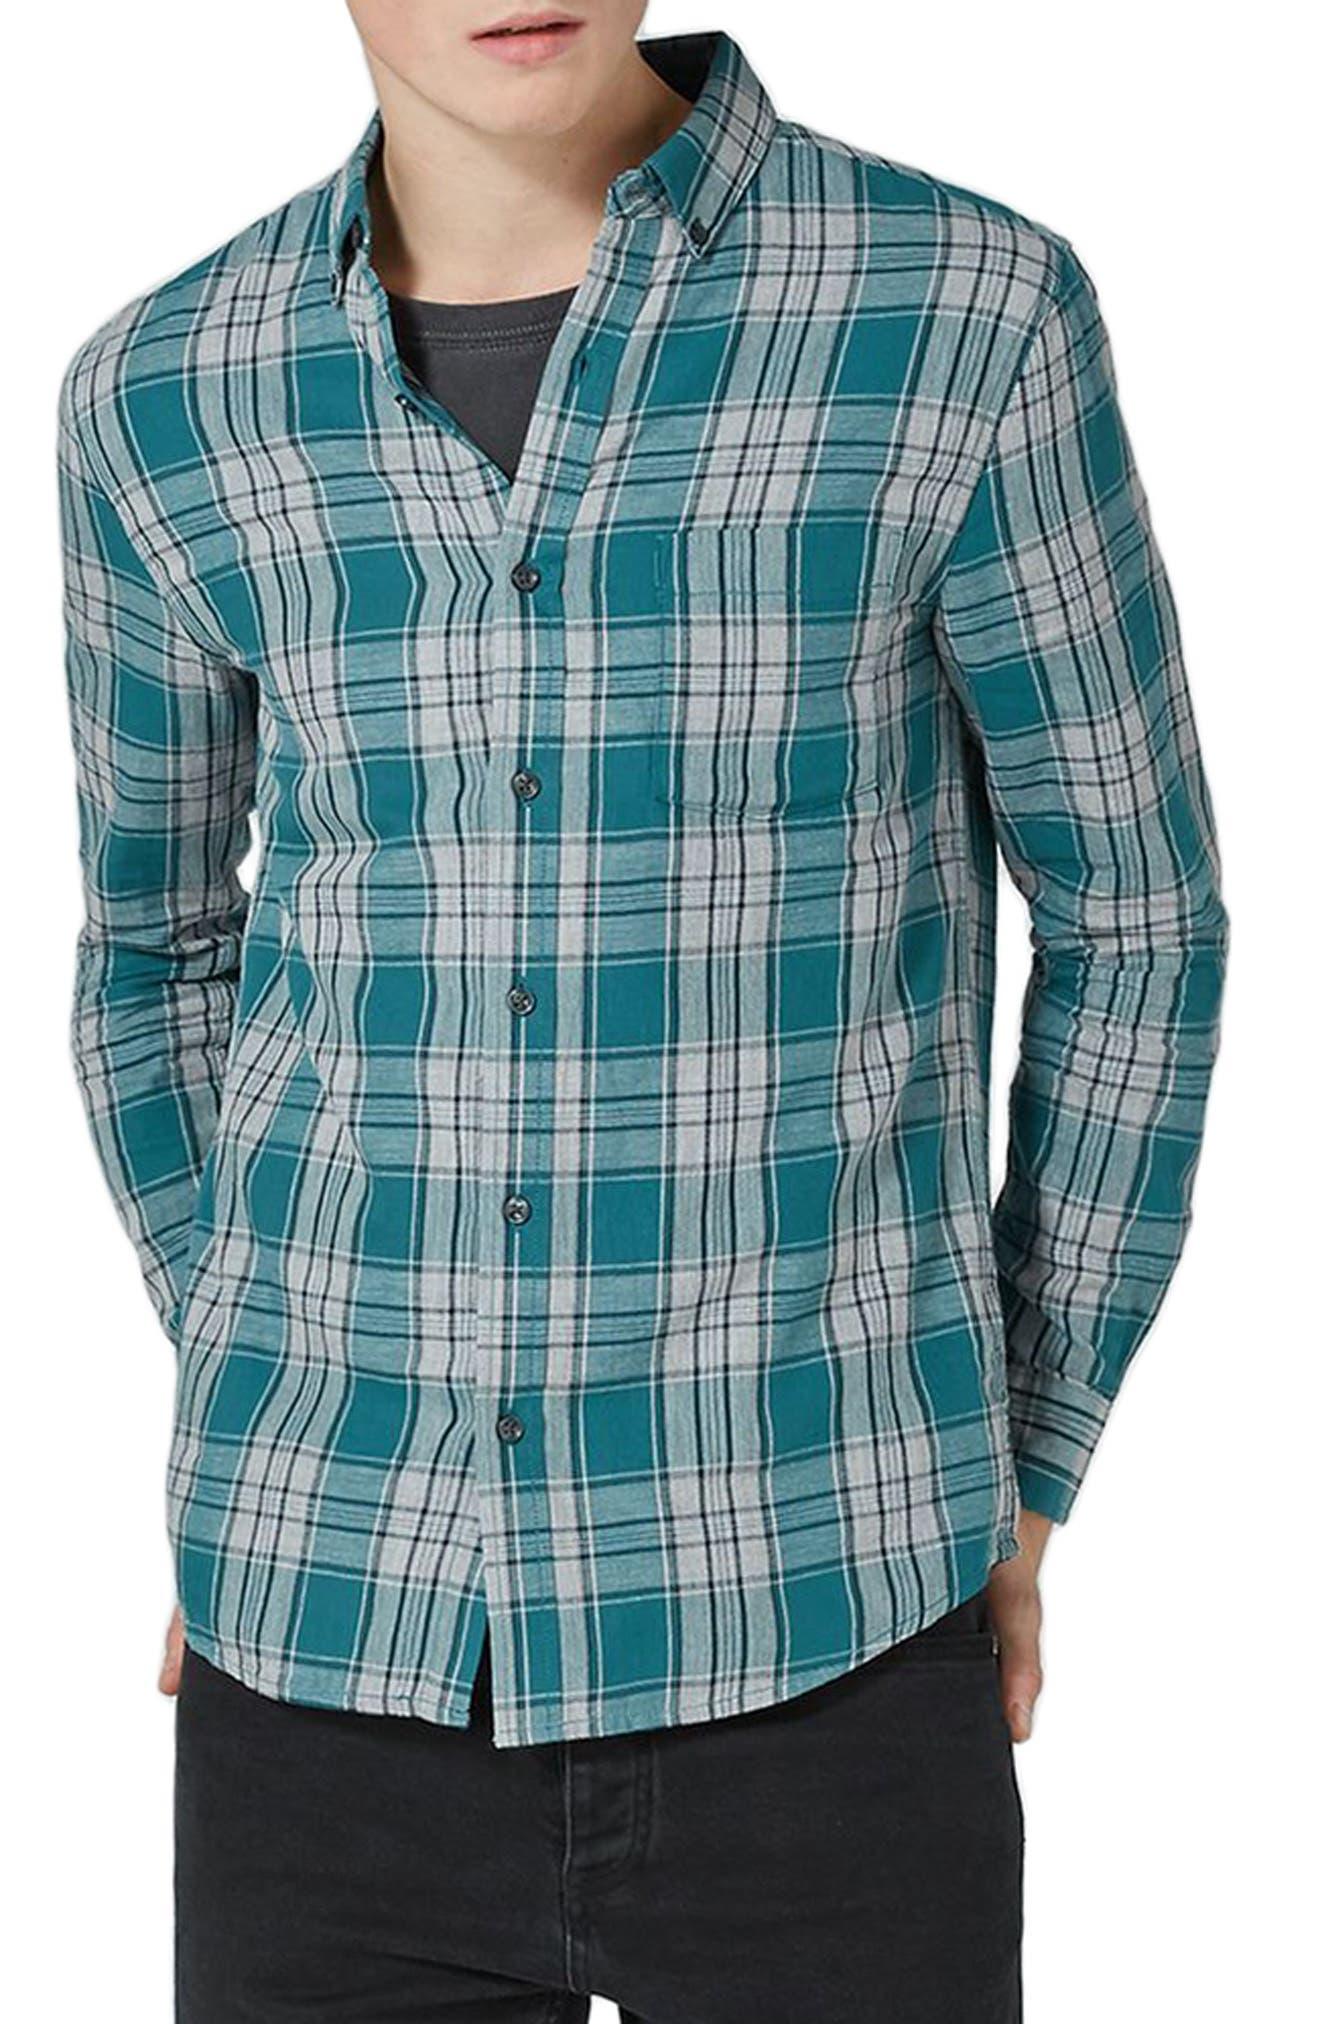 Charlie Check Shirt,                         Main,                         color, Blue Multi